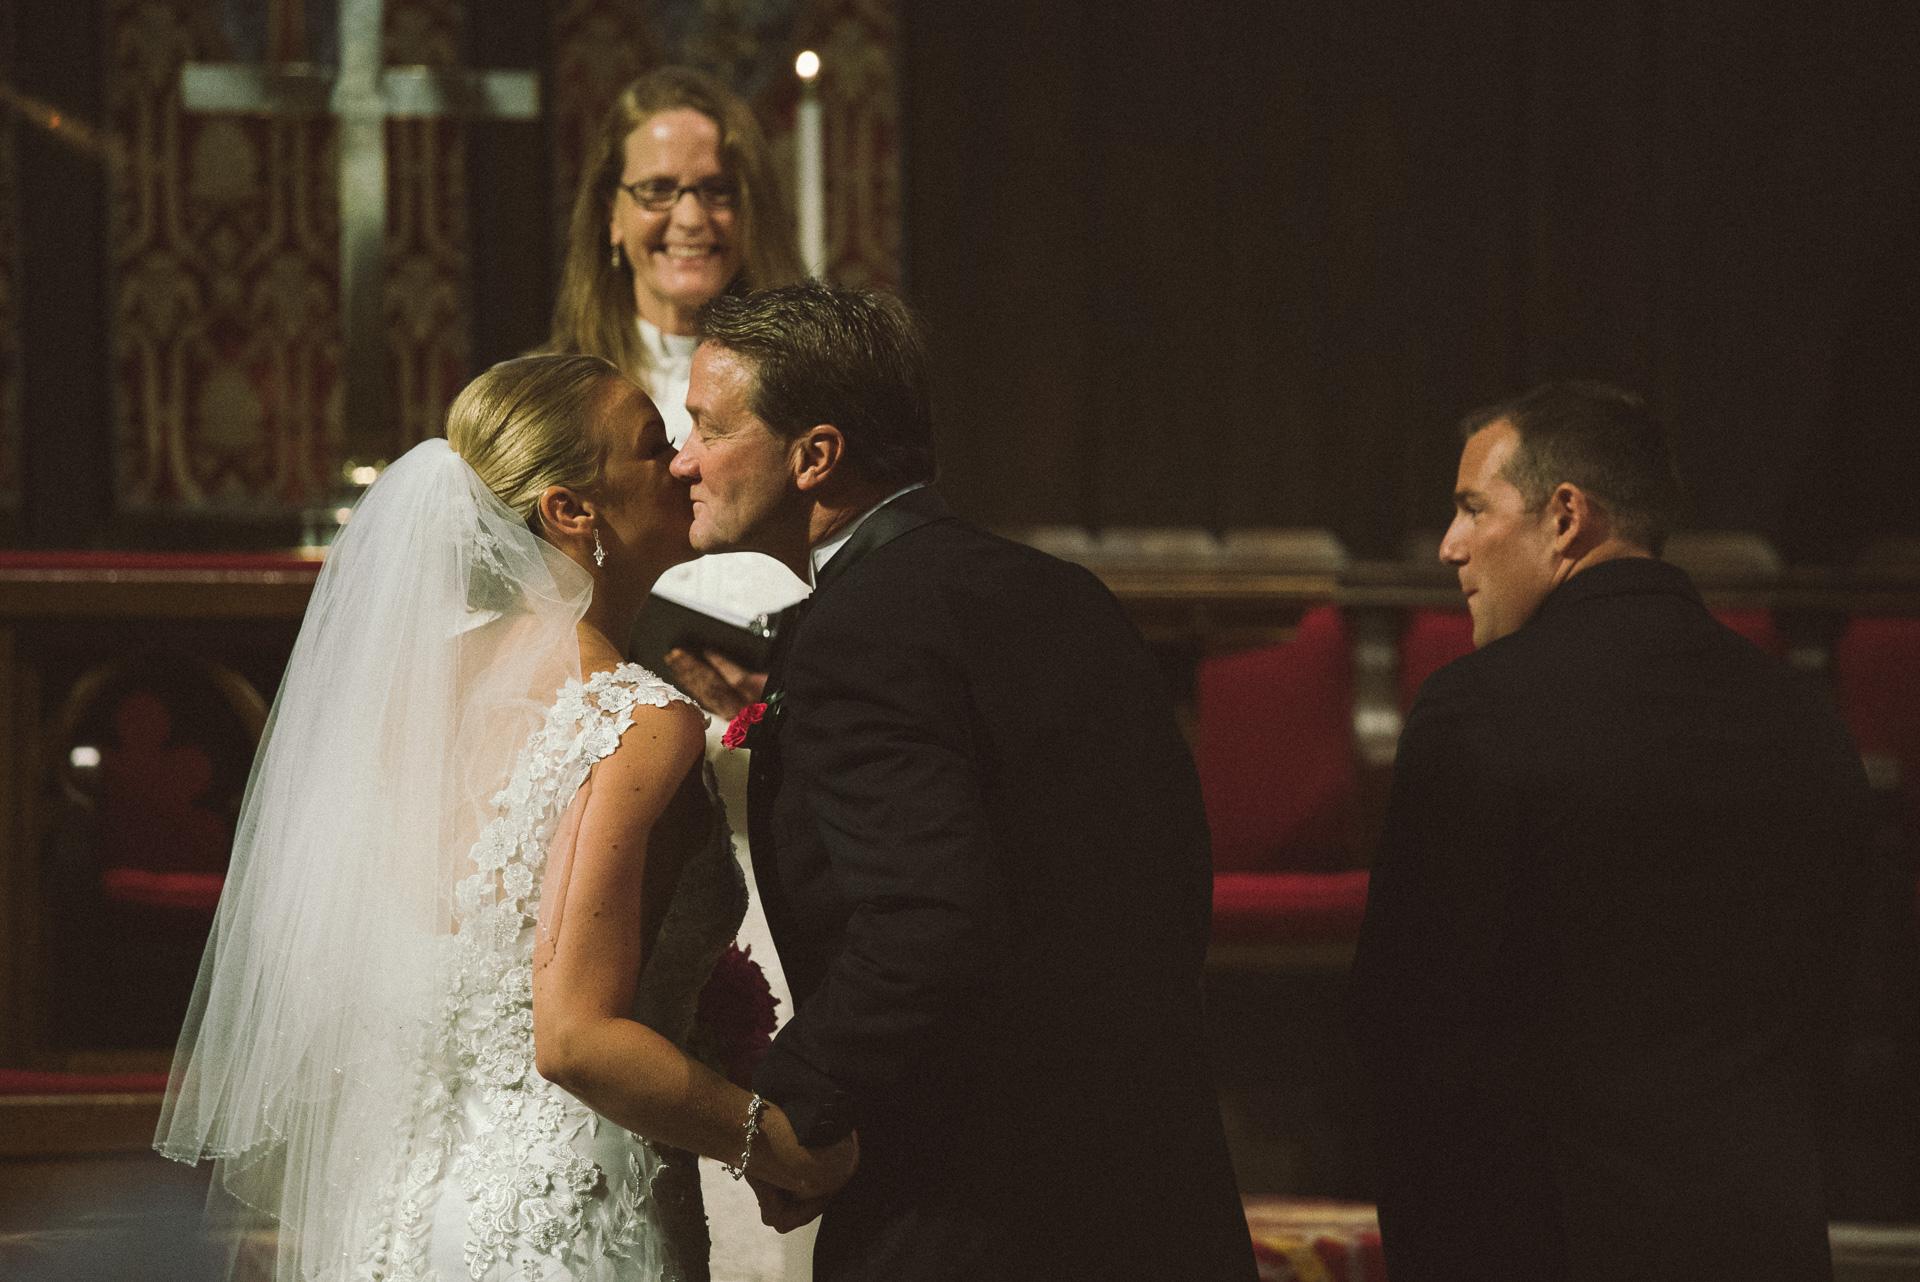 Dayton Wedding Photographer - FOB kisses bride